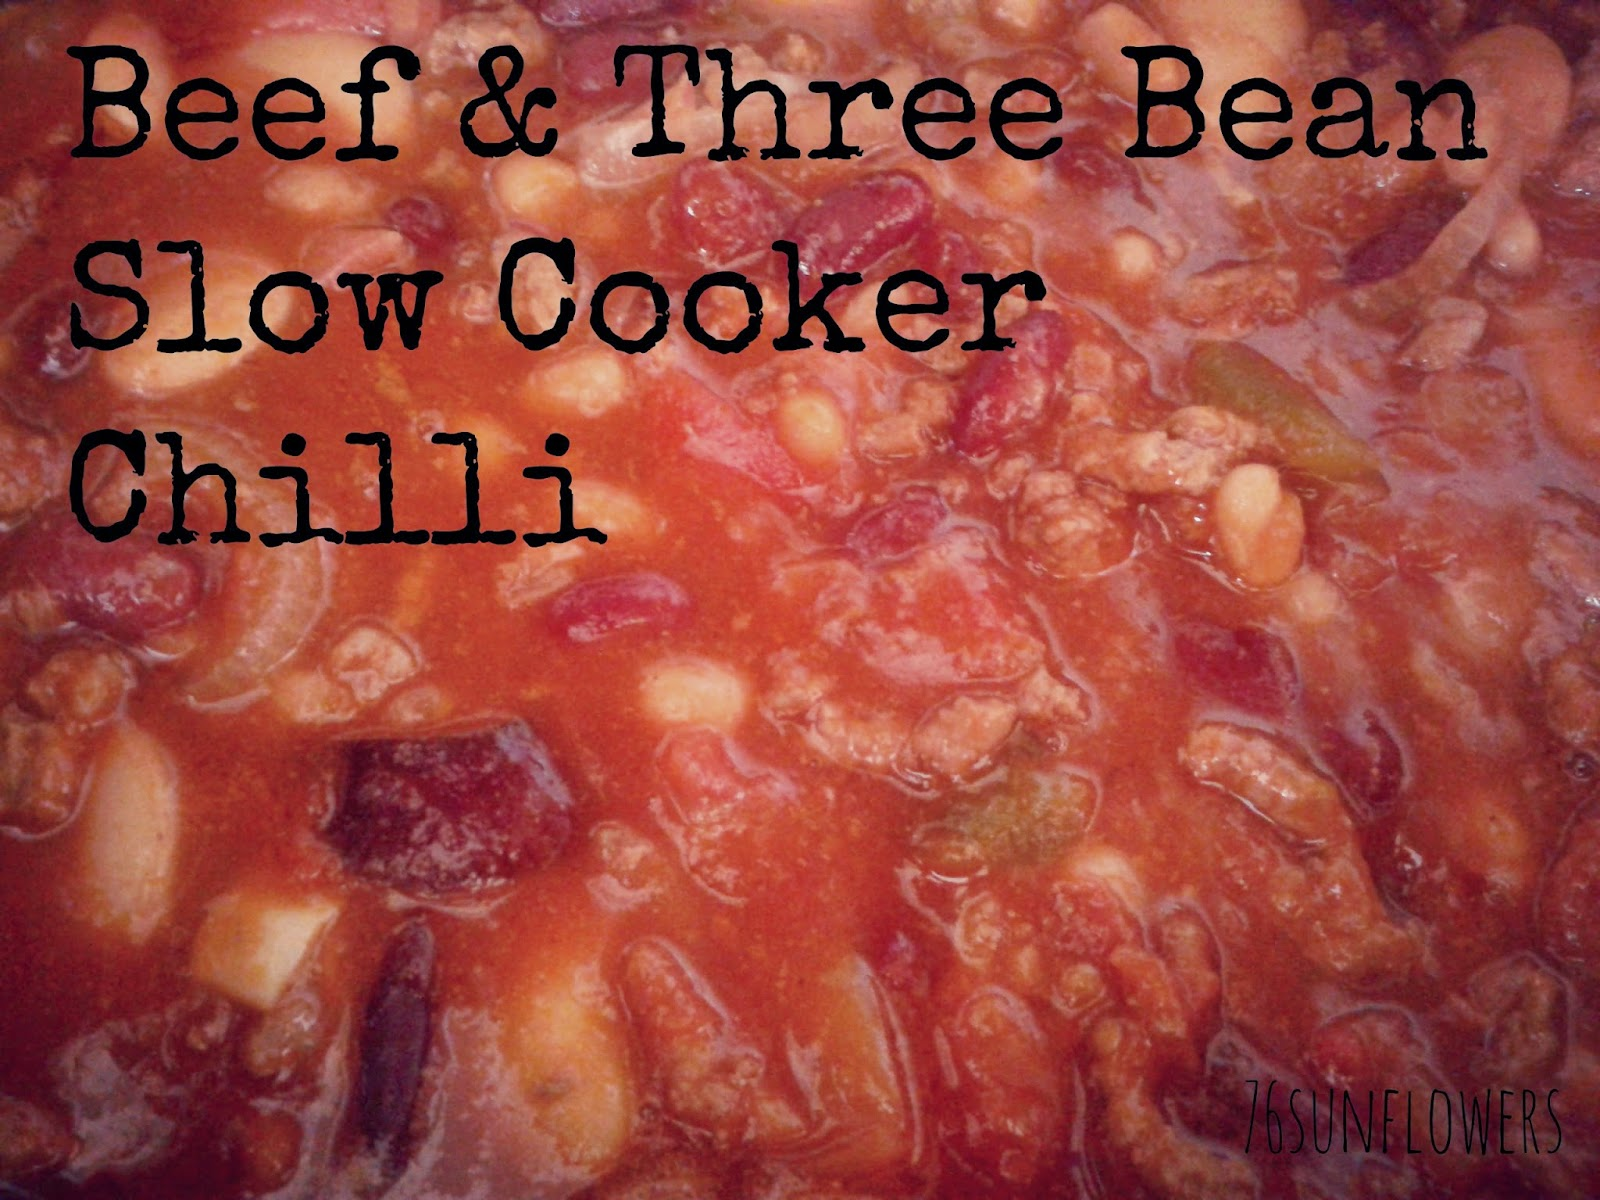 Beef & Three Bean Slow Cooker Chilli // 76sunflowers